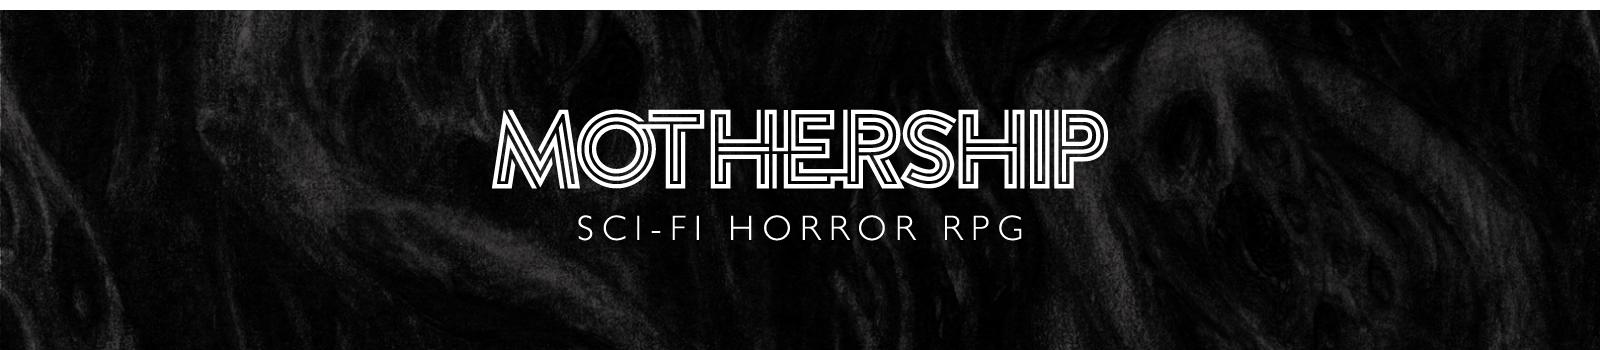 Mothership-header.png